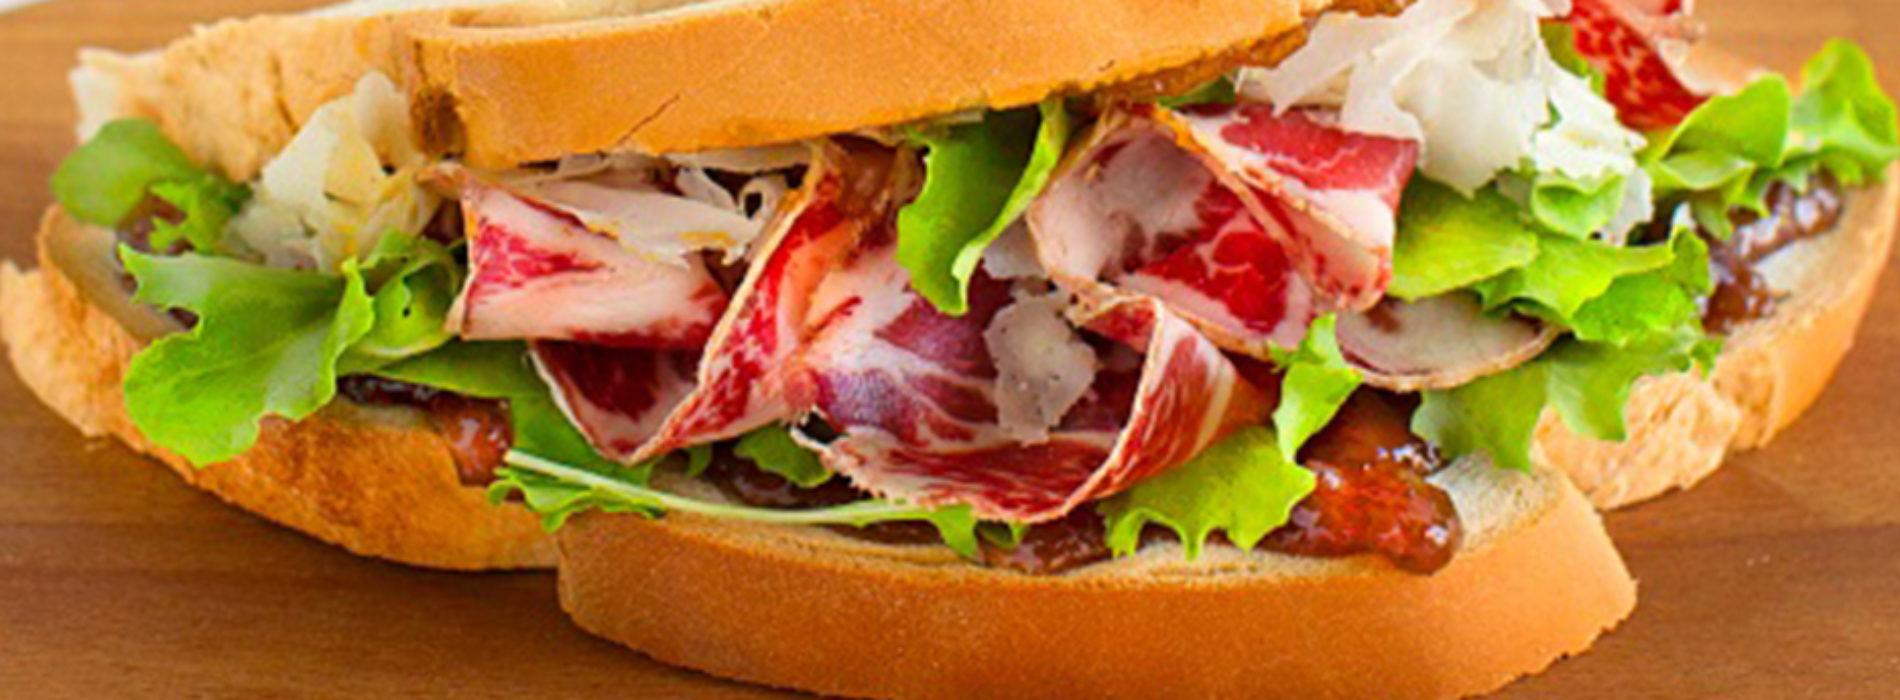 Miccone Milano, lo street food pavese che mancava